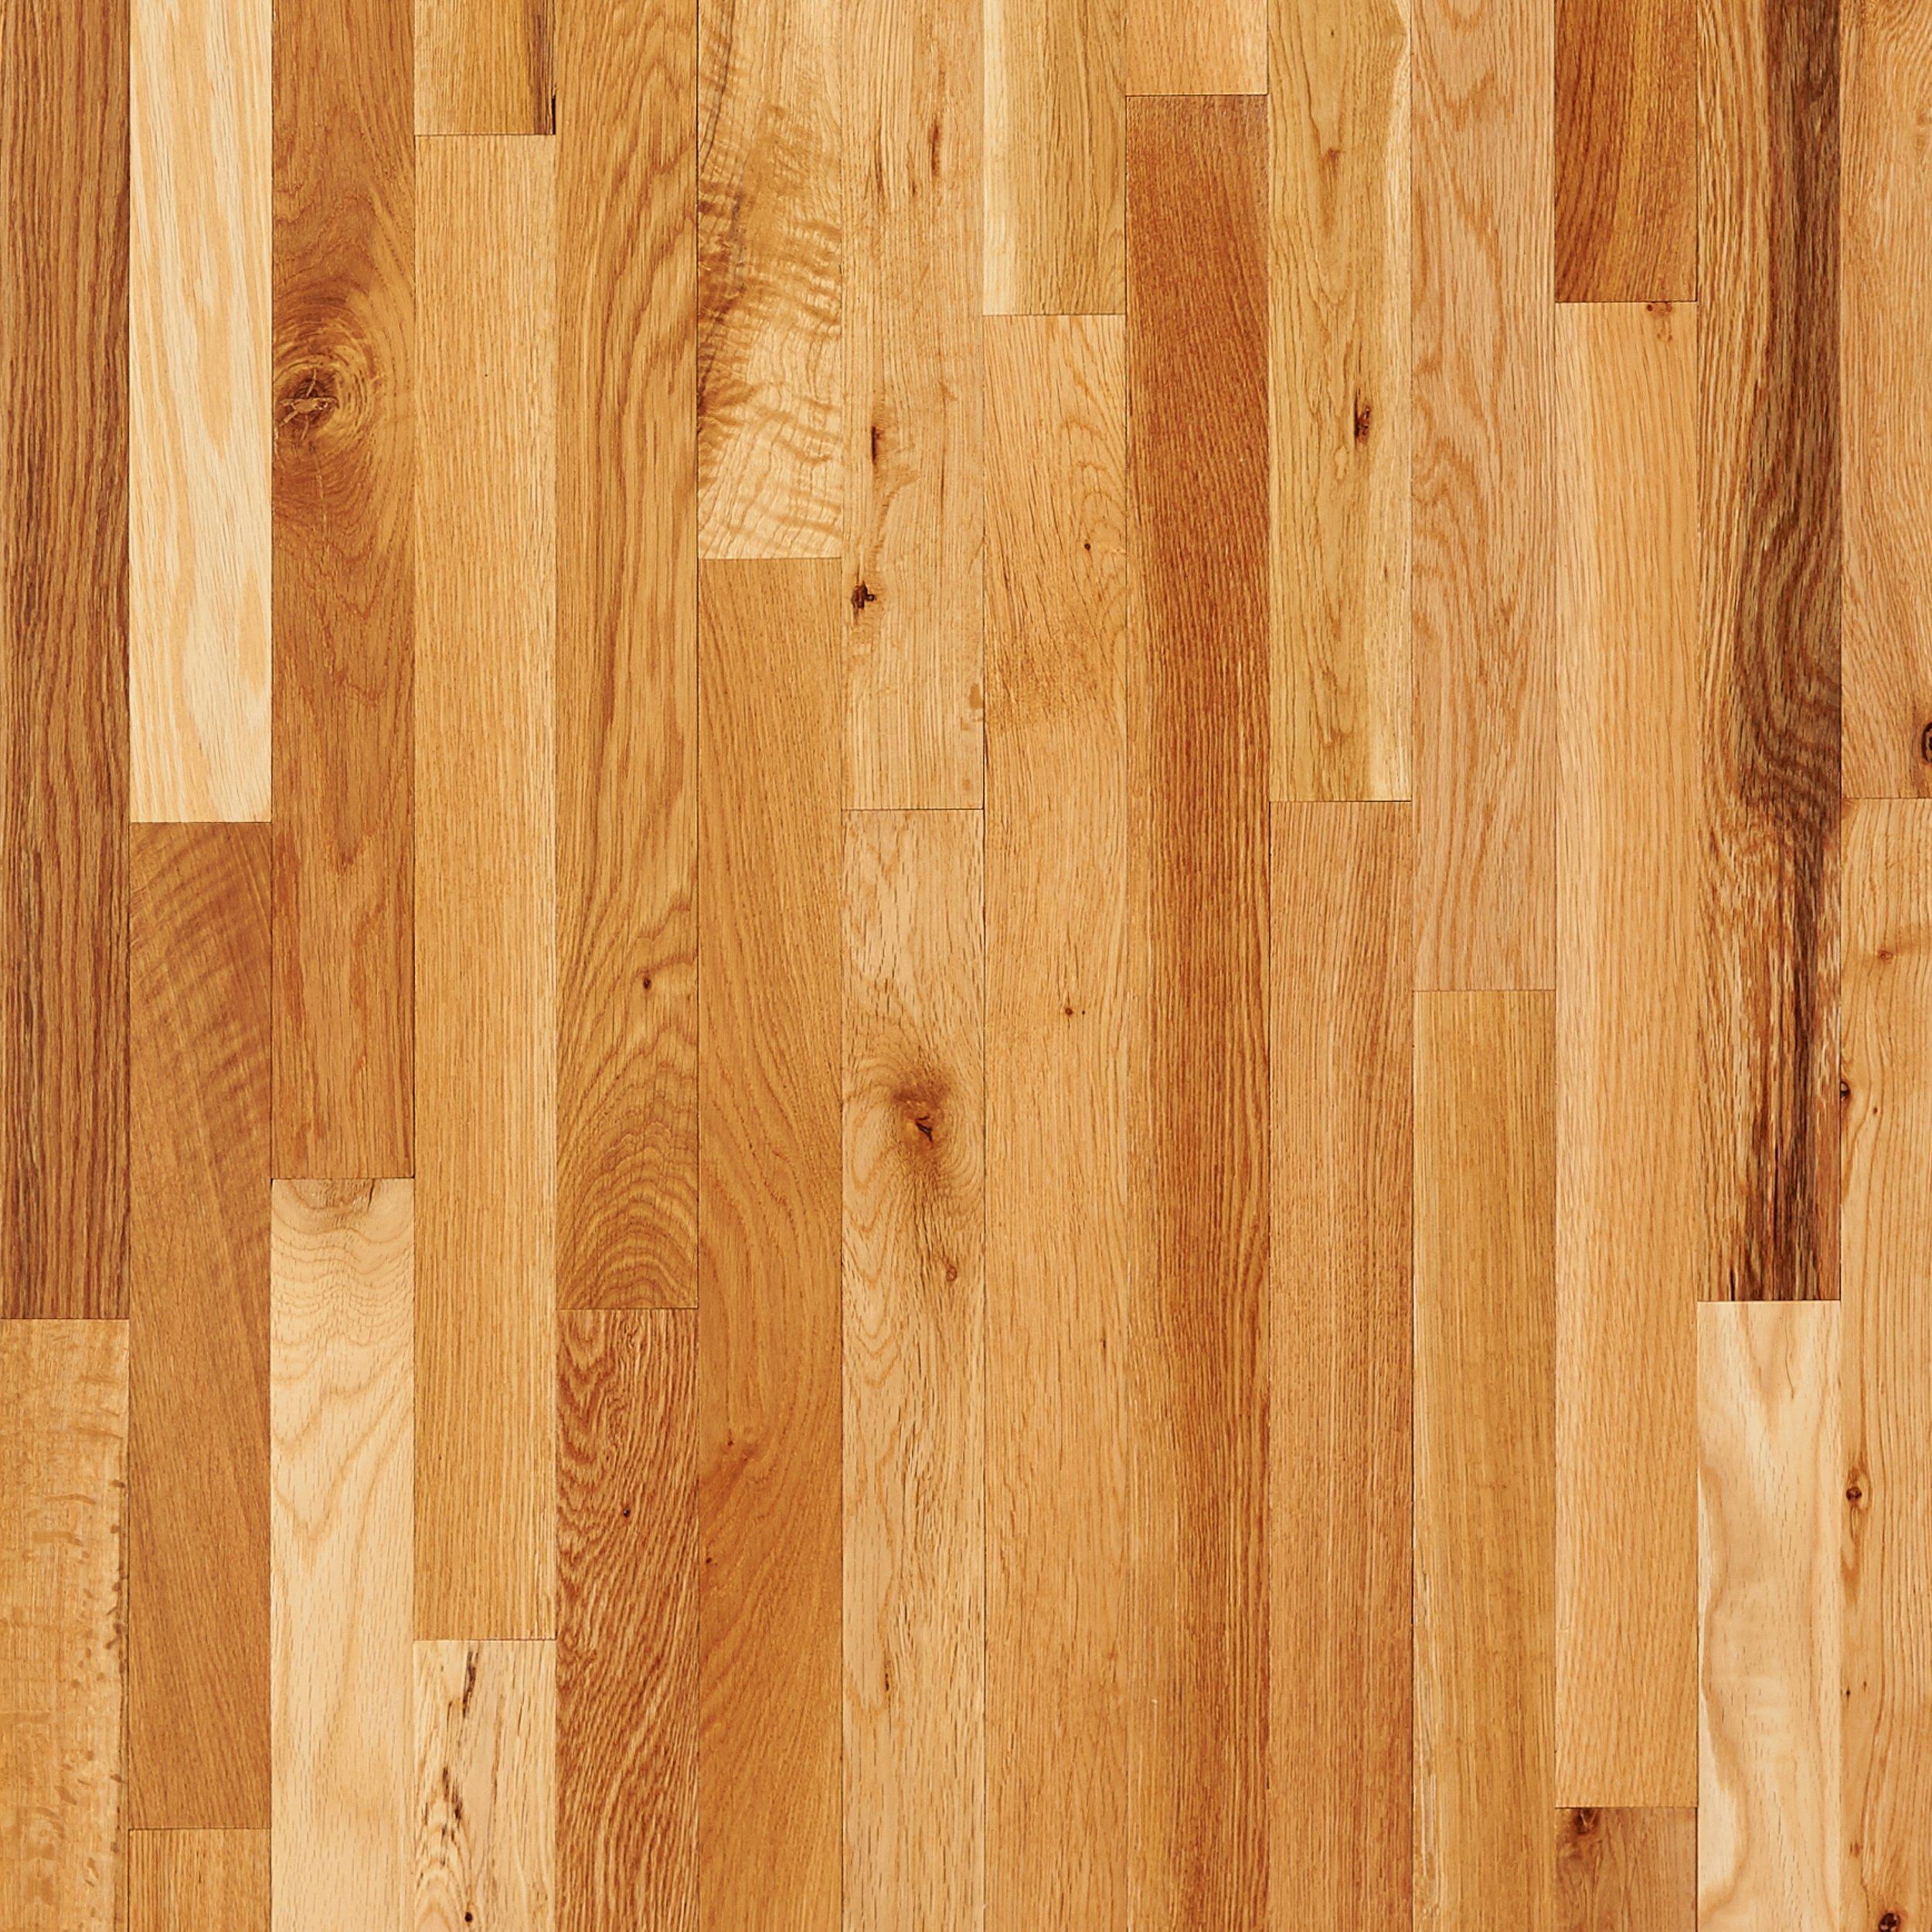 oak hardwood flooring natural oak smooth solid hardwood DARAJKU